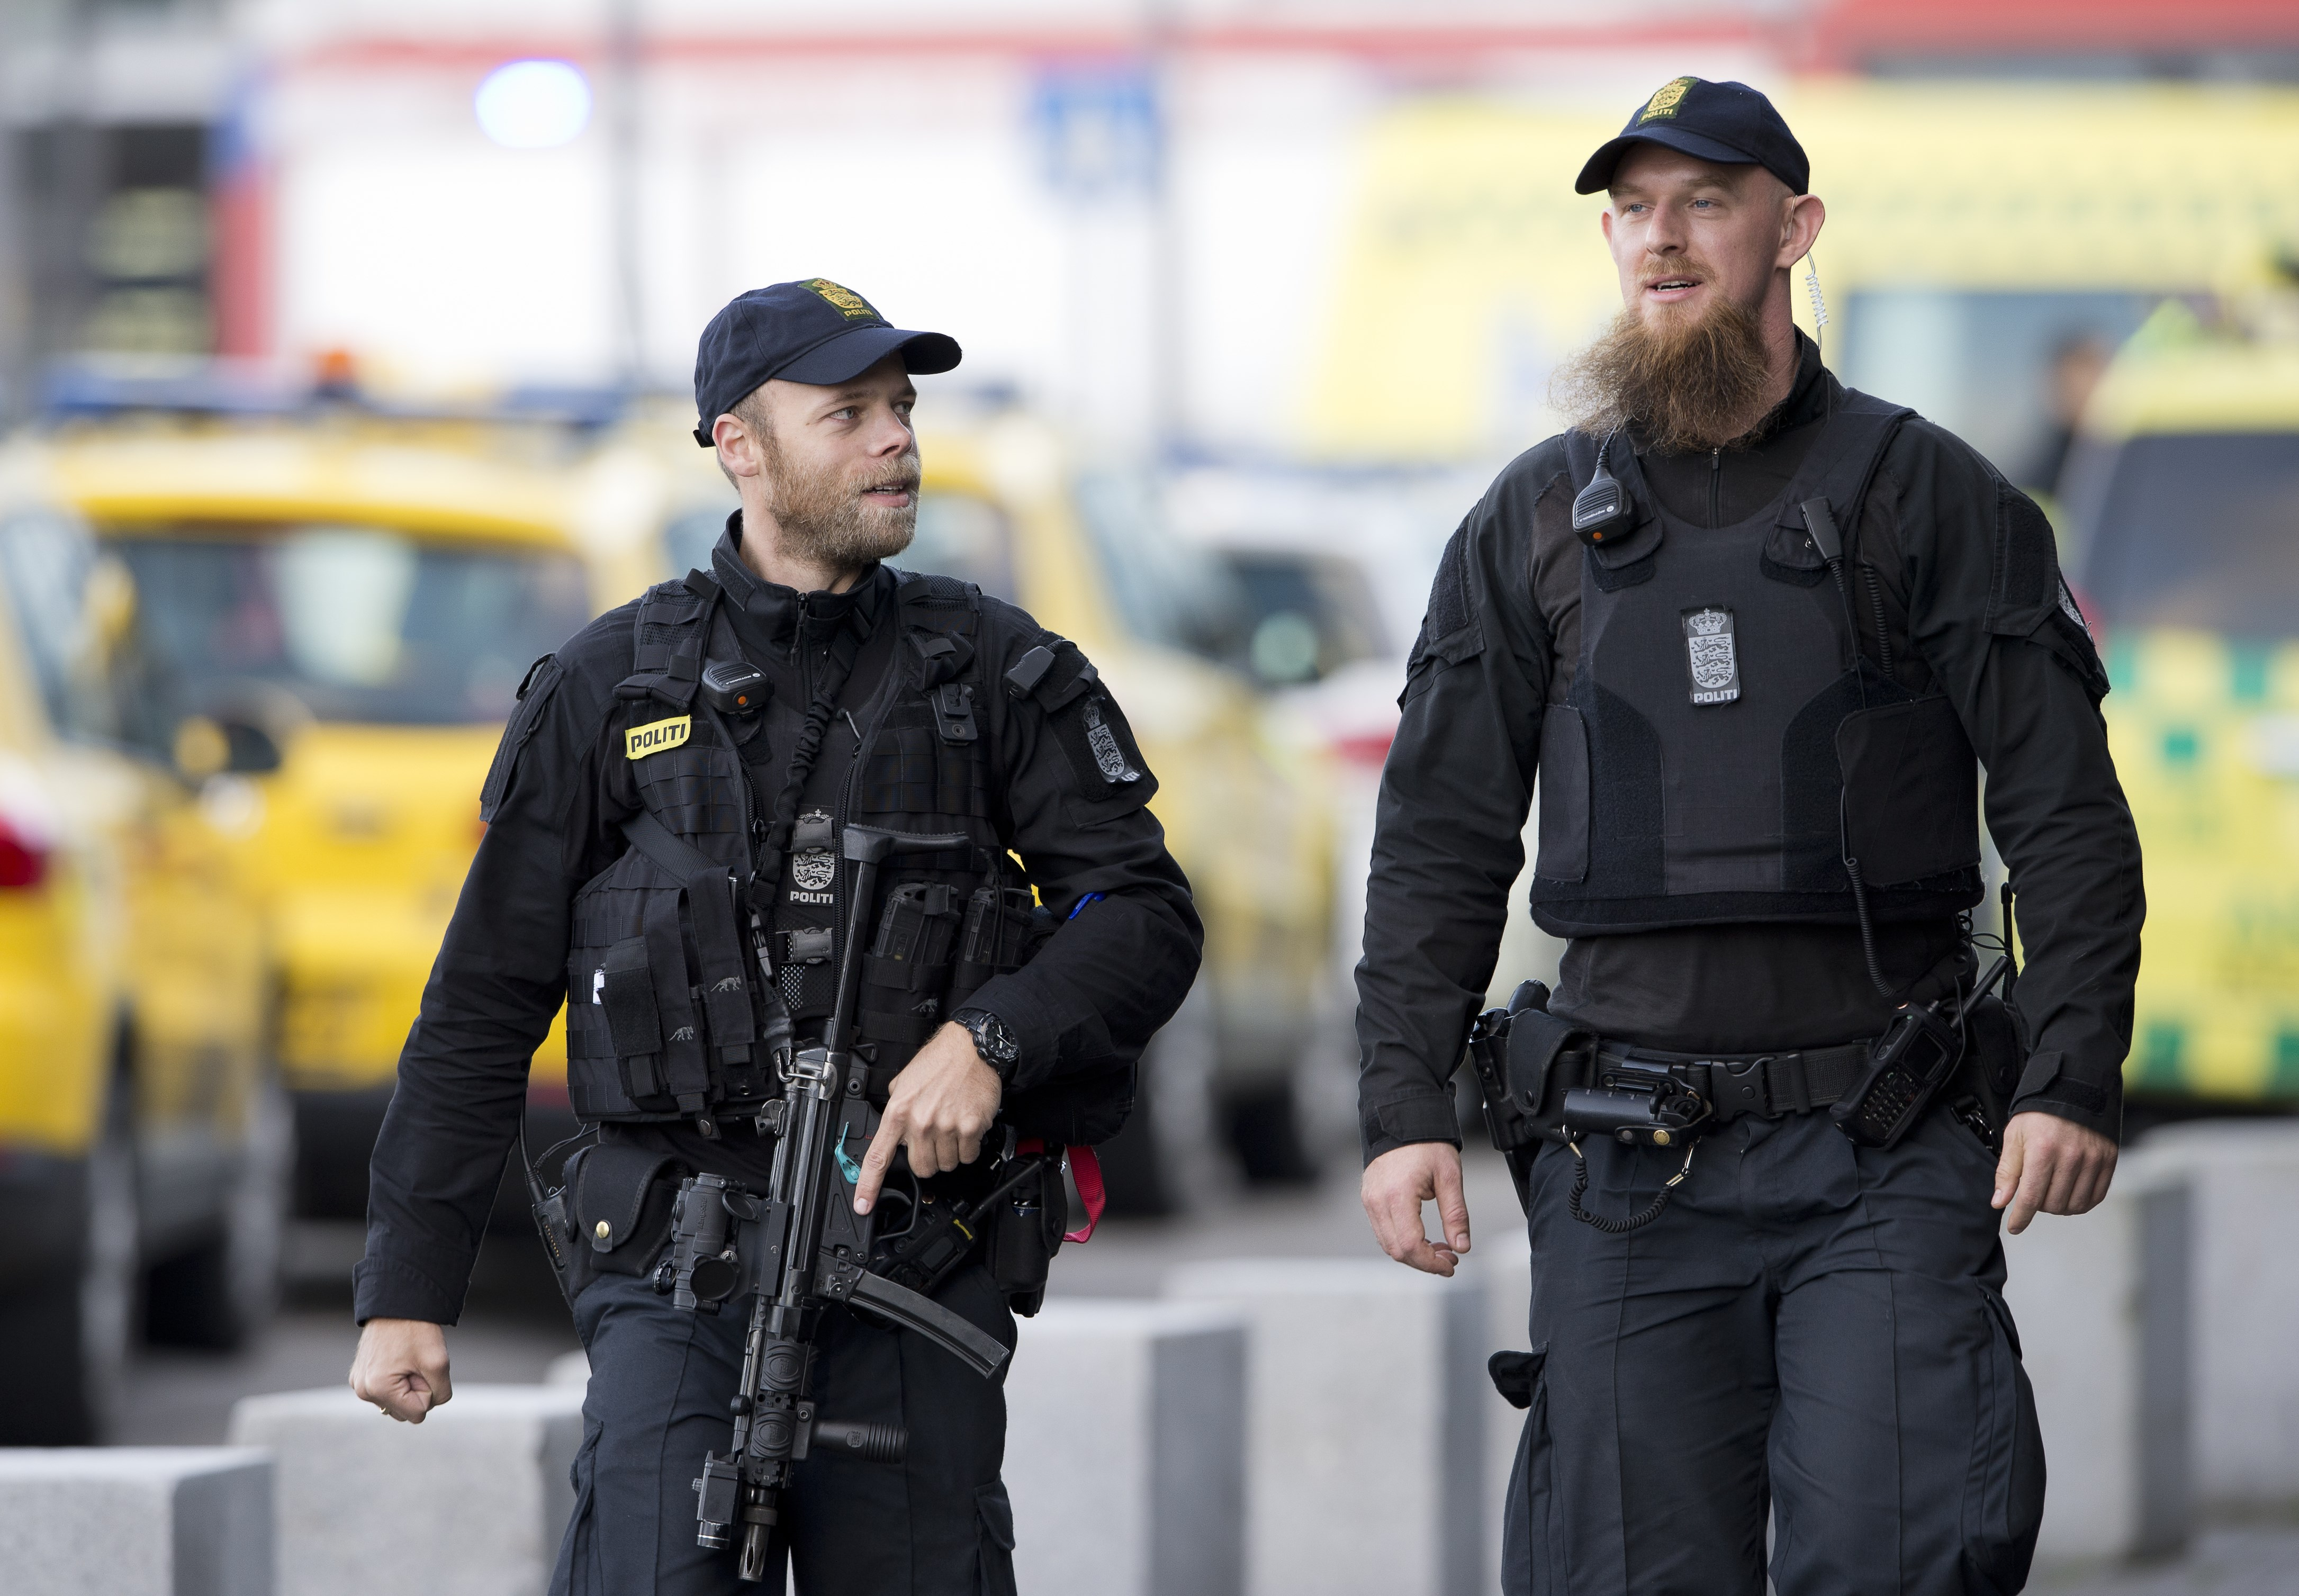 Neun Festnahmen nach Protesten gegen Corona-Maßnahmen in Dänemark